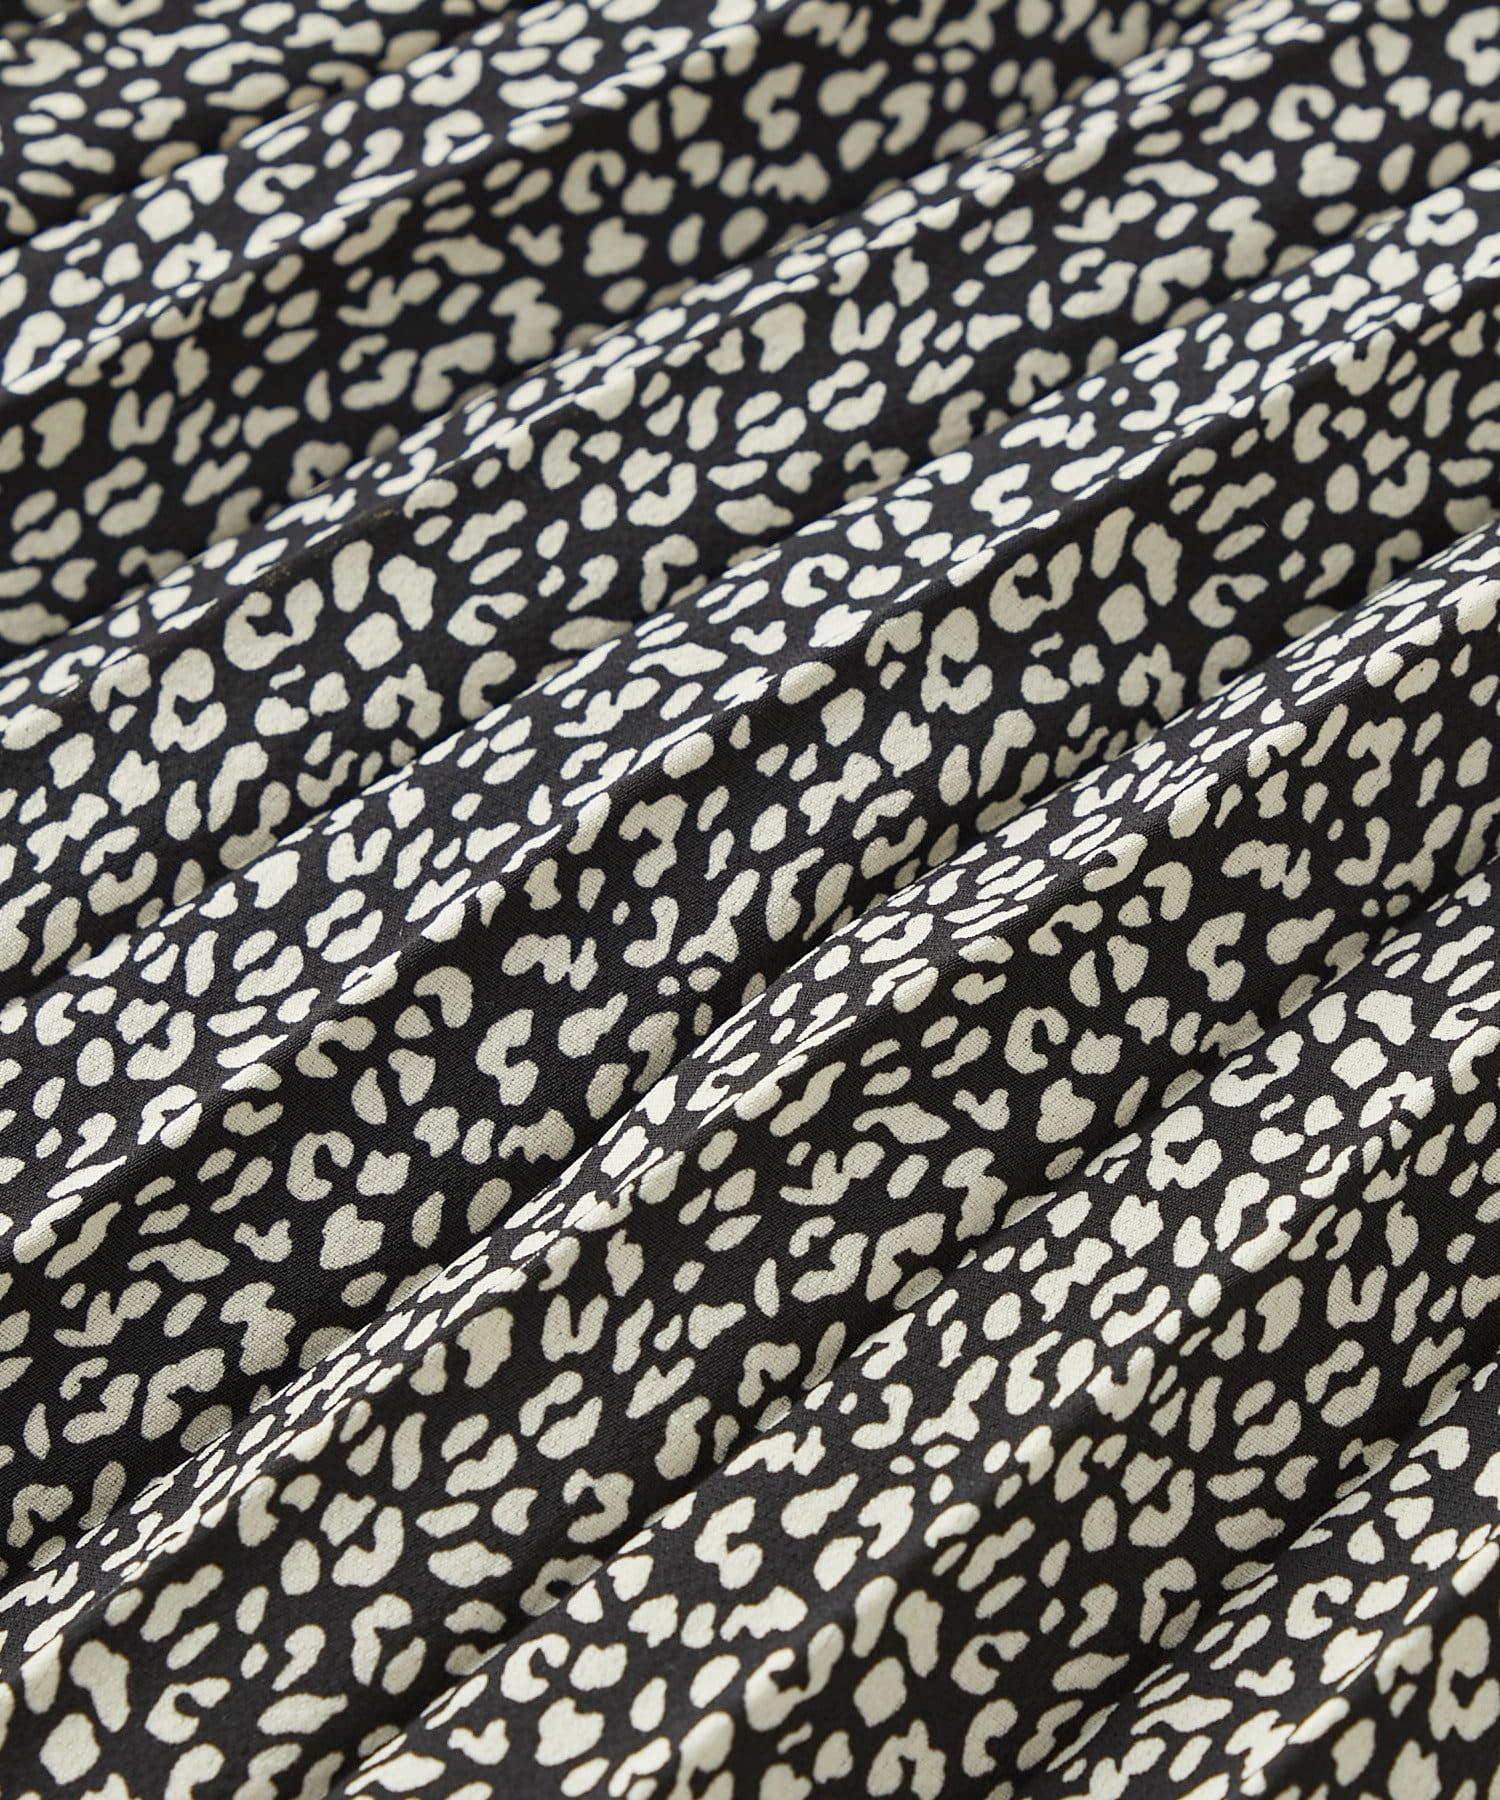 RIVE DROITE(リヴドロワ) 【それぞれ単品でも着られる優秀セット】プルオーバー&プリーツスカートセット